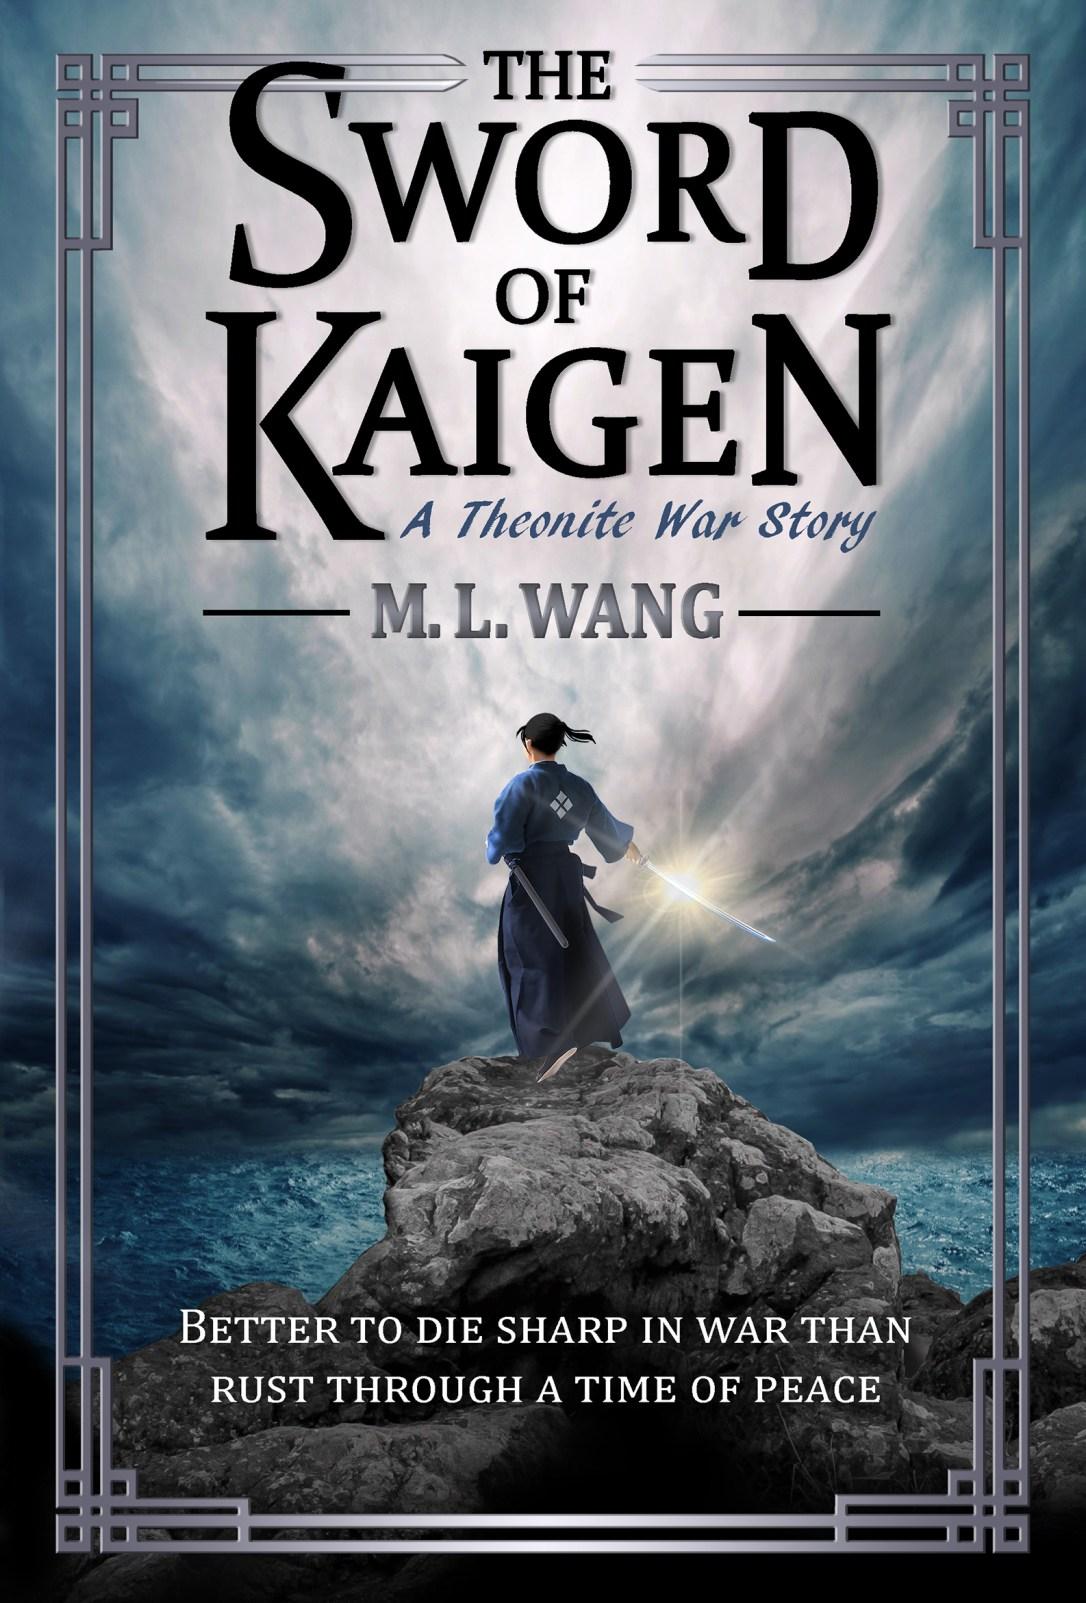 The Sword of Kaigen by M. L. Wang